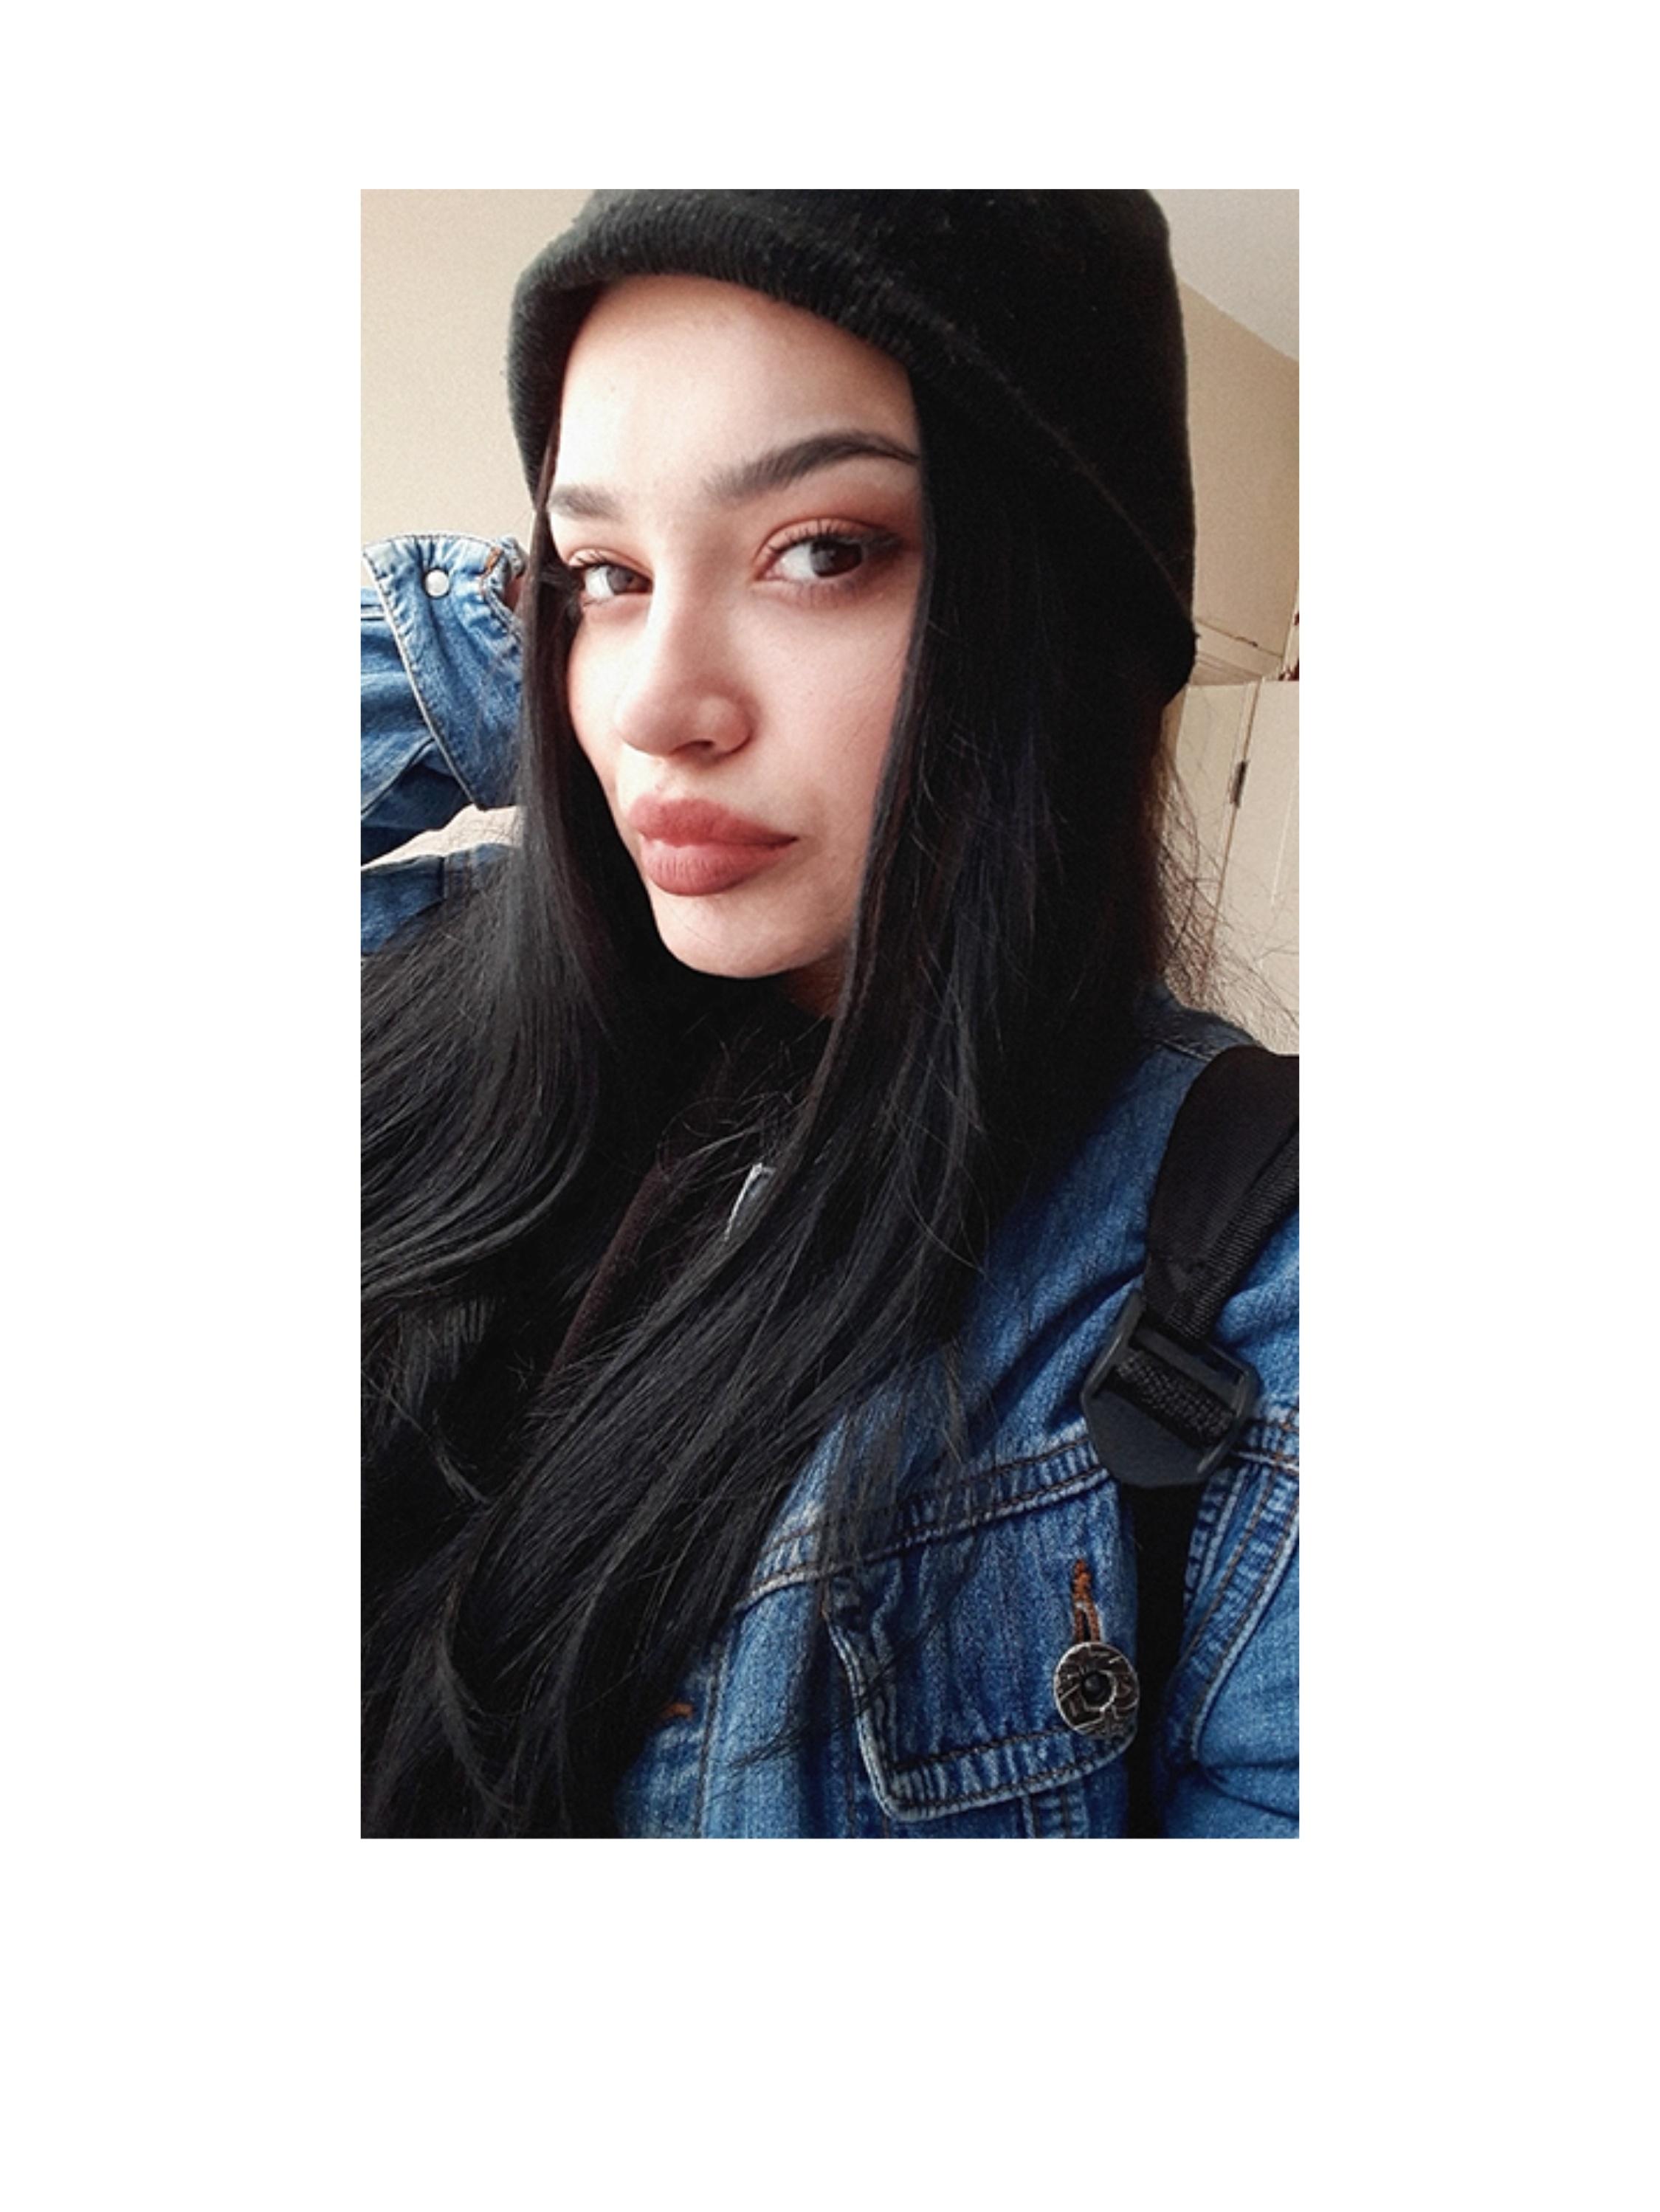 BeautyPlus_20200513032753820_save - ryuklemobi